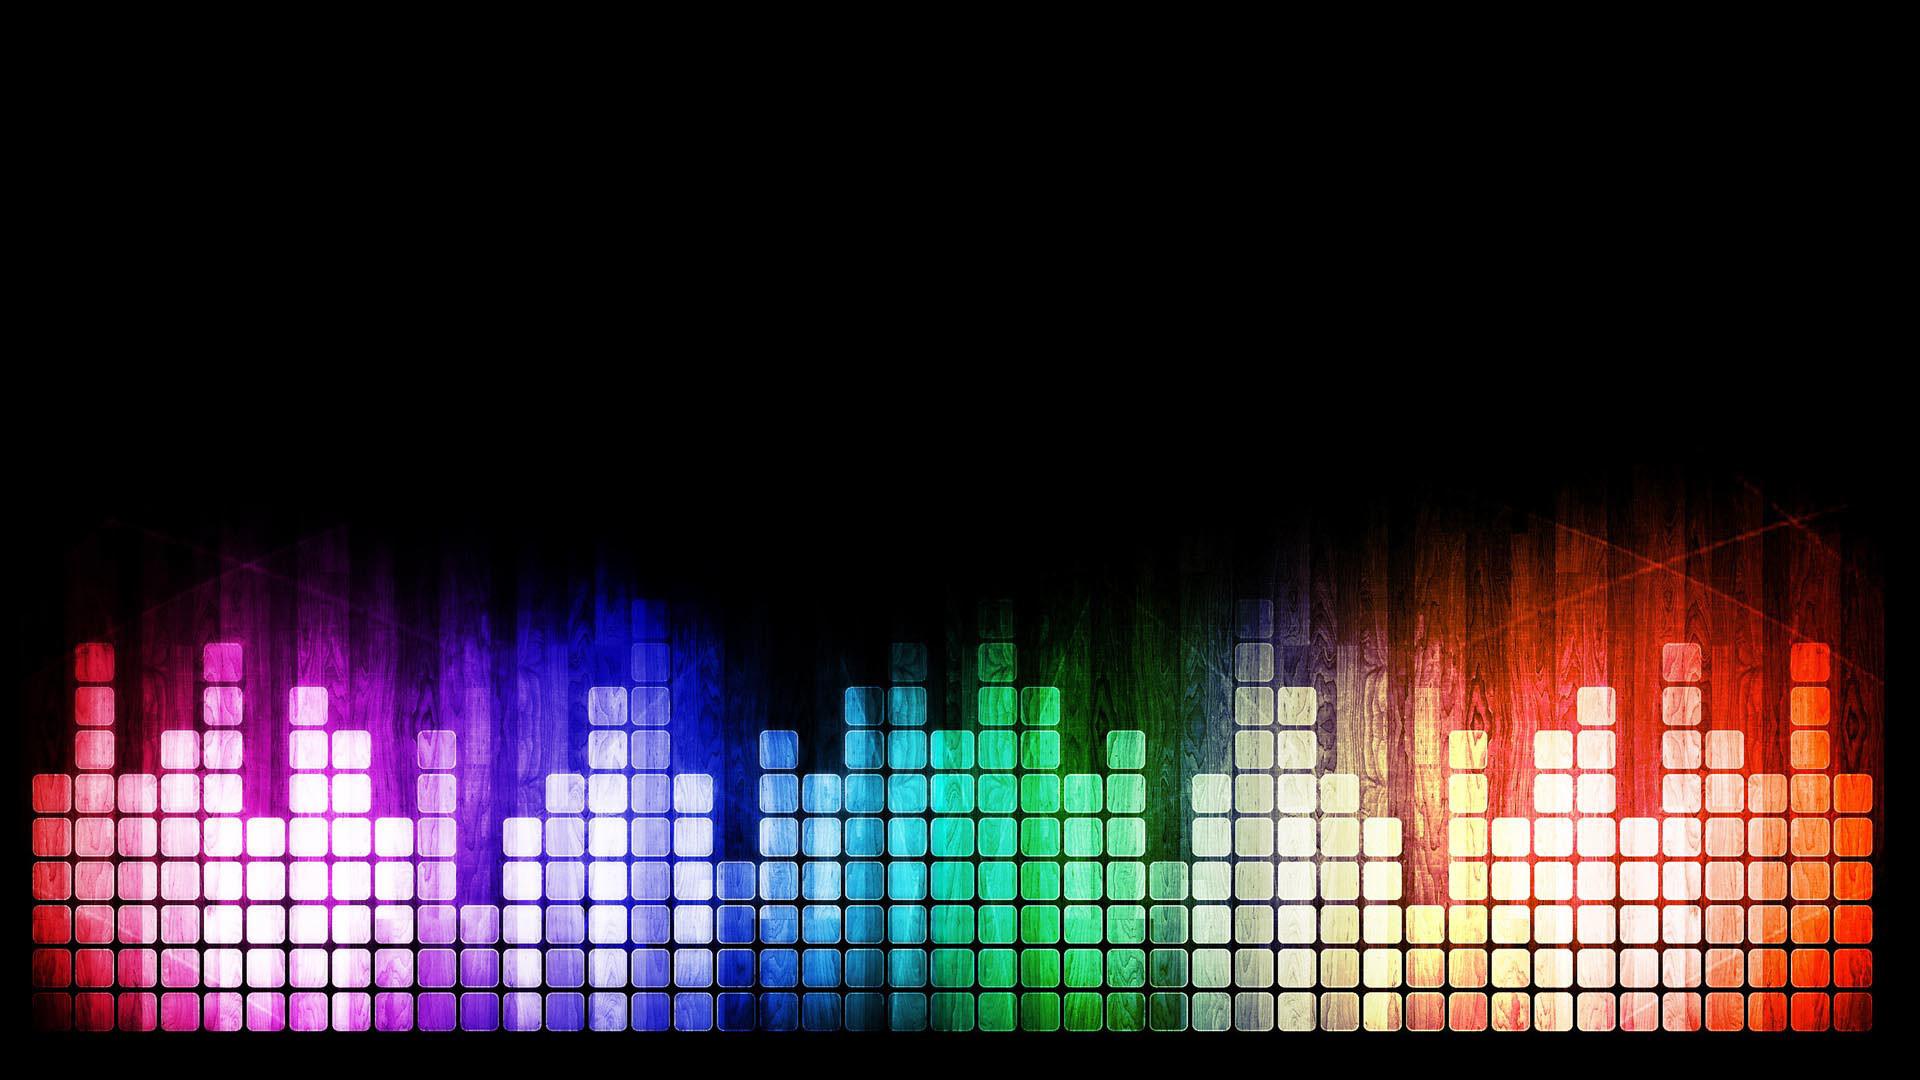 hd pics photos music beats colorful playing neon desktop background  wallpaper